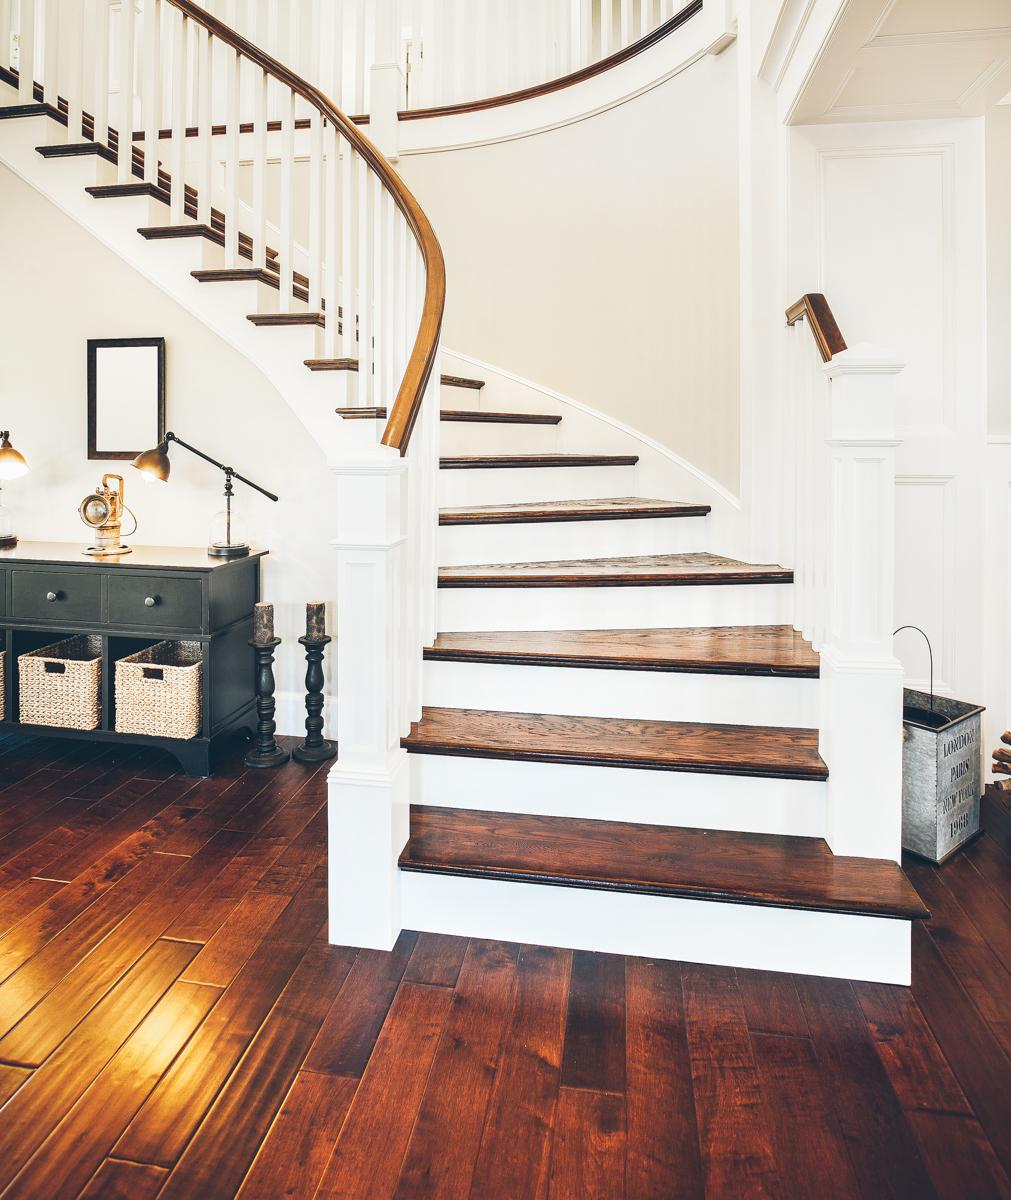 Production Reno Tahoe Stairs-13.jpg